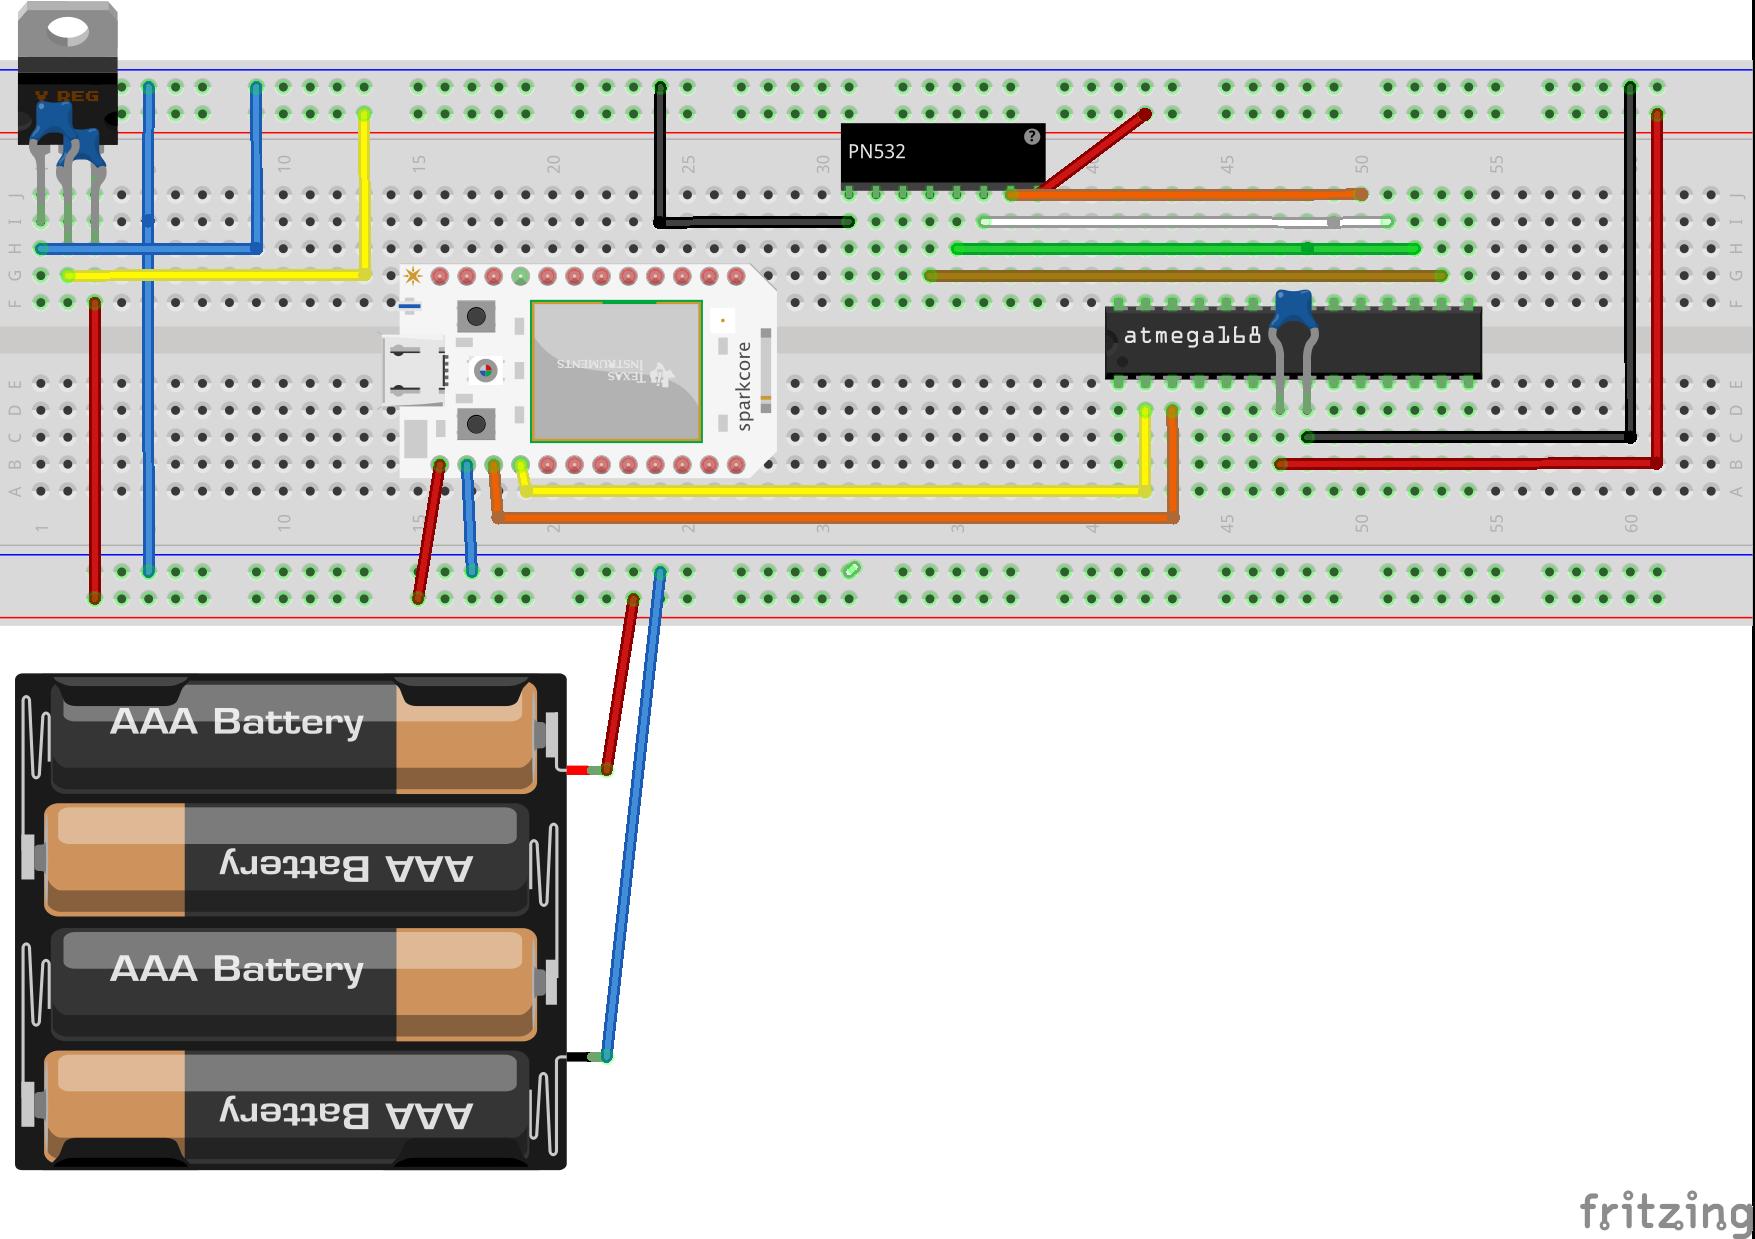 Pn532 sparkcore bb